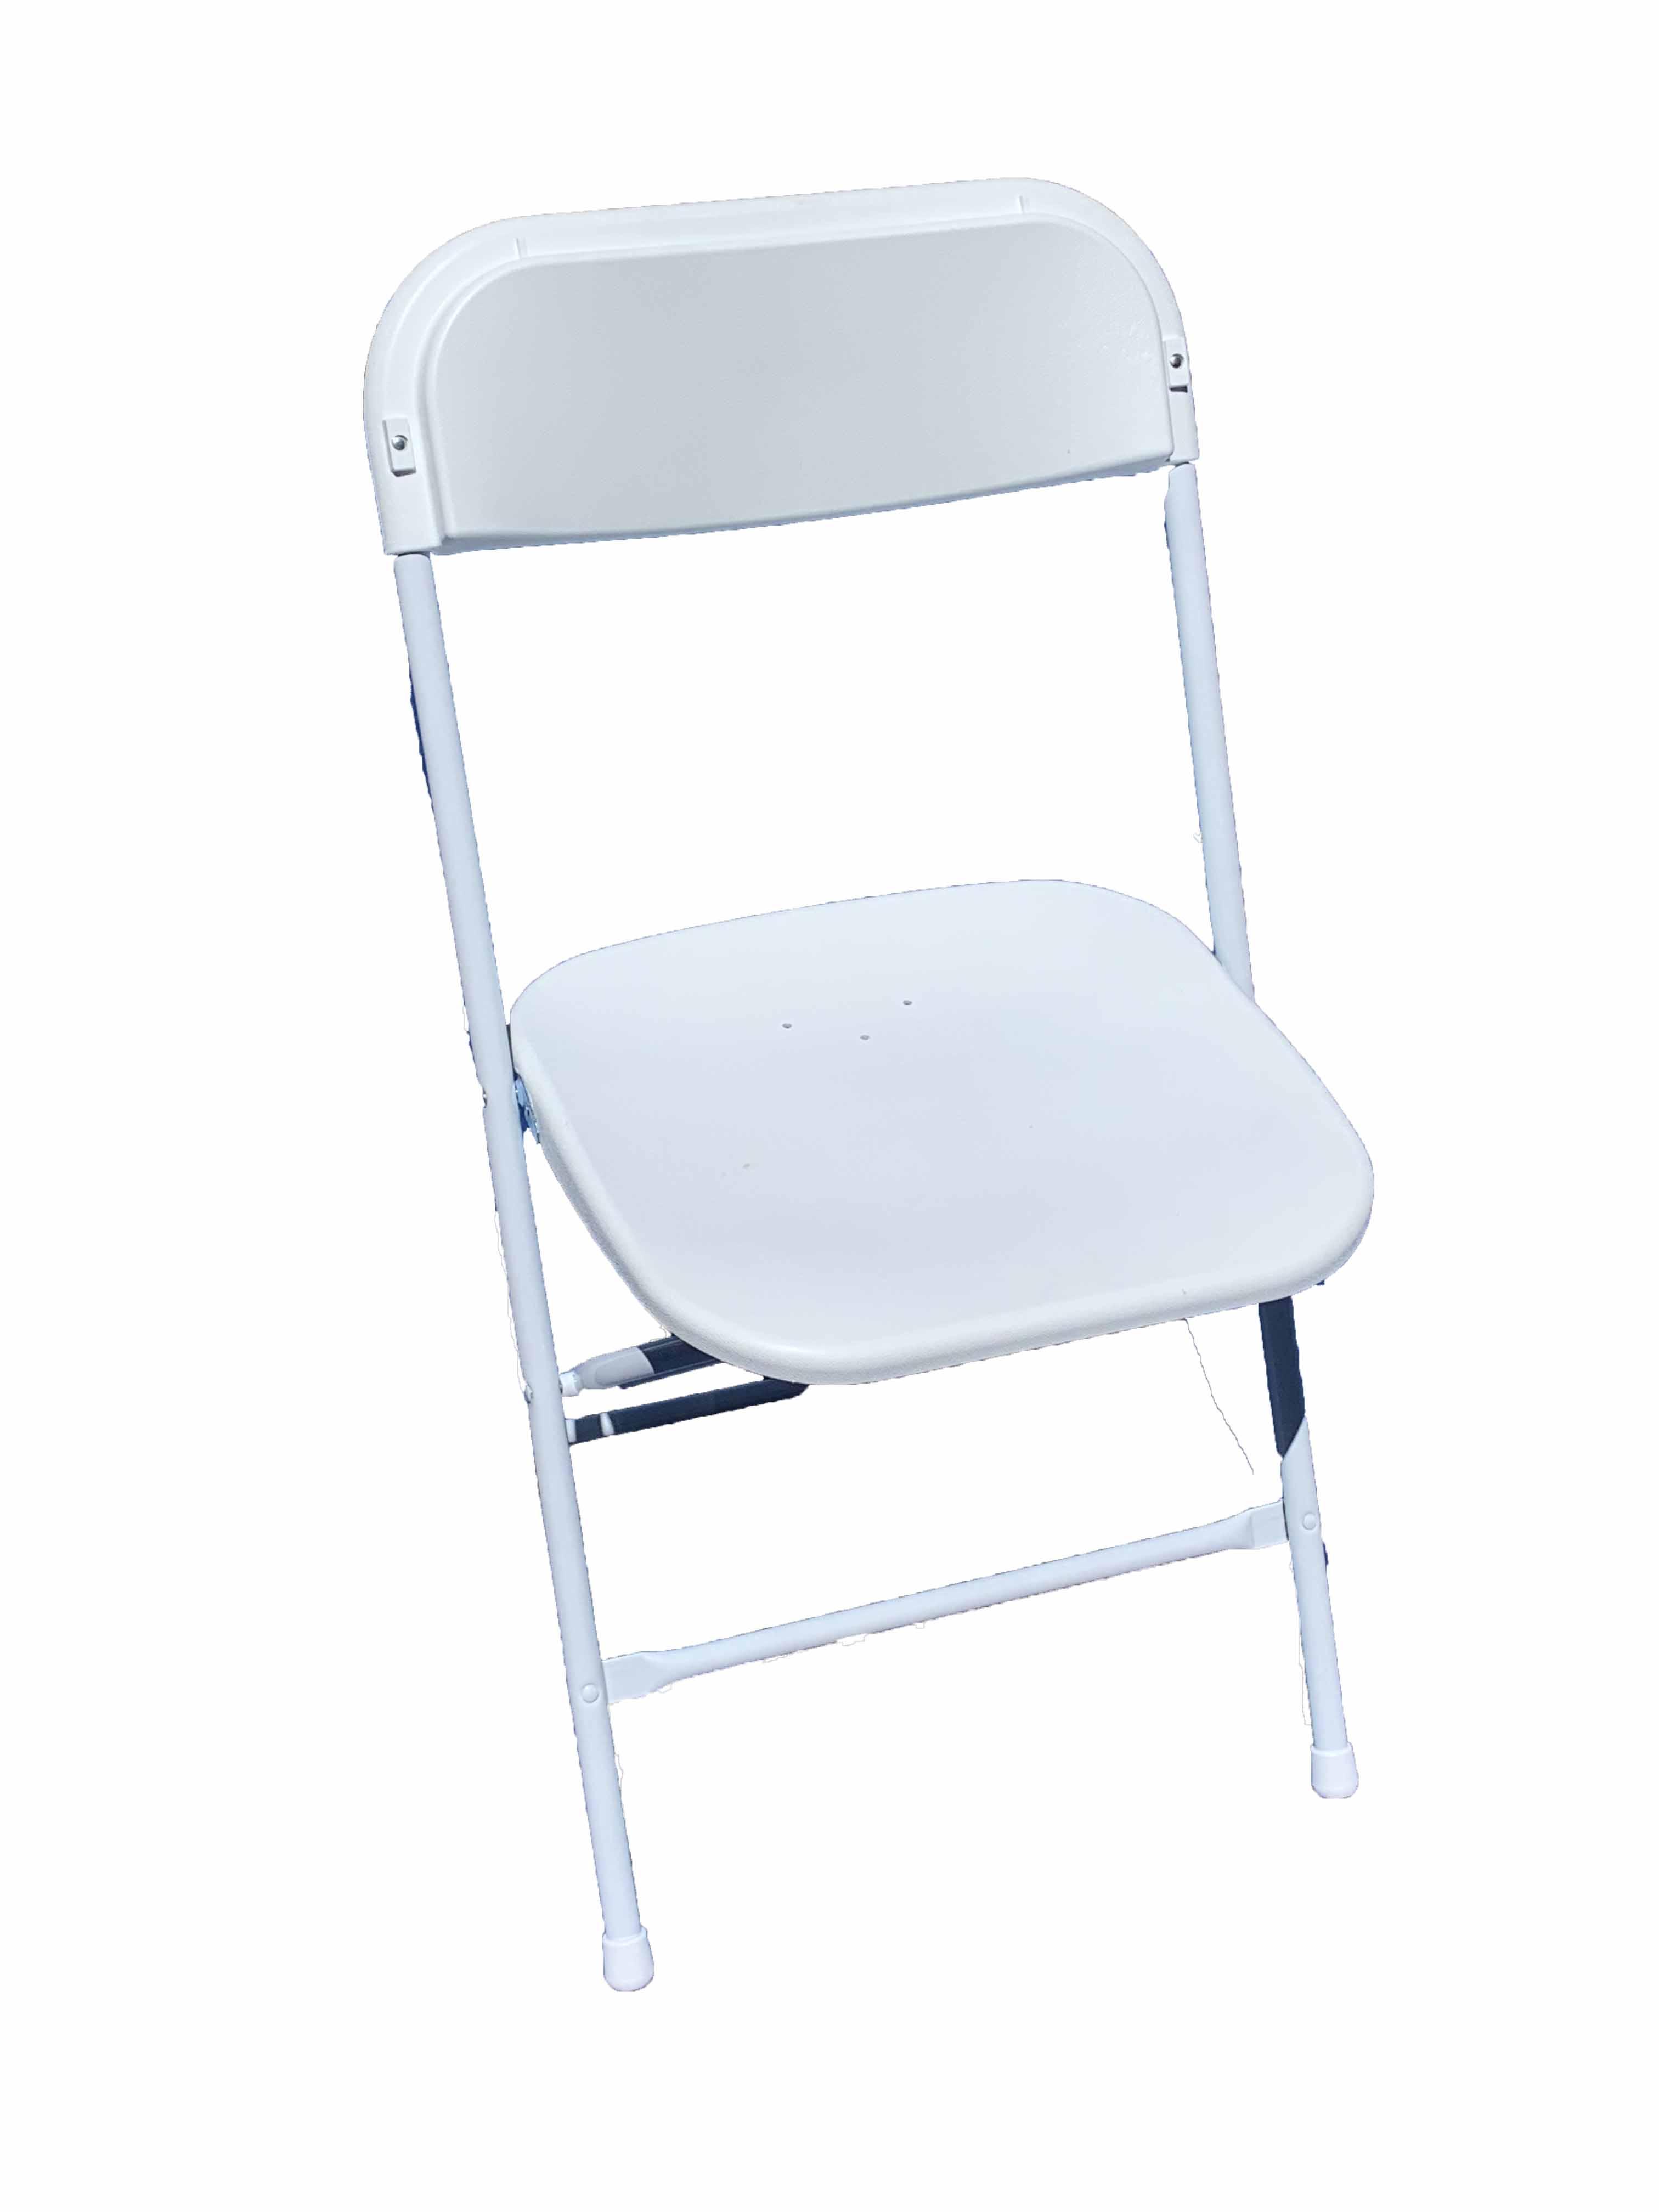 Chair Rentals Santa Rosa